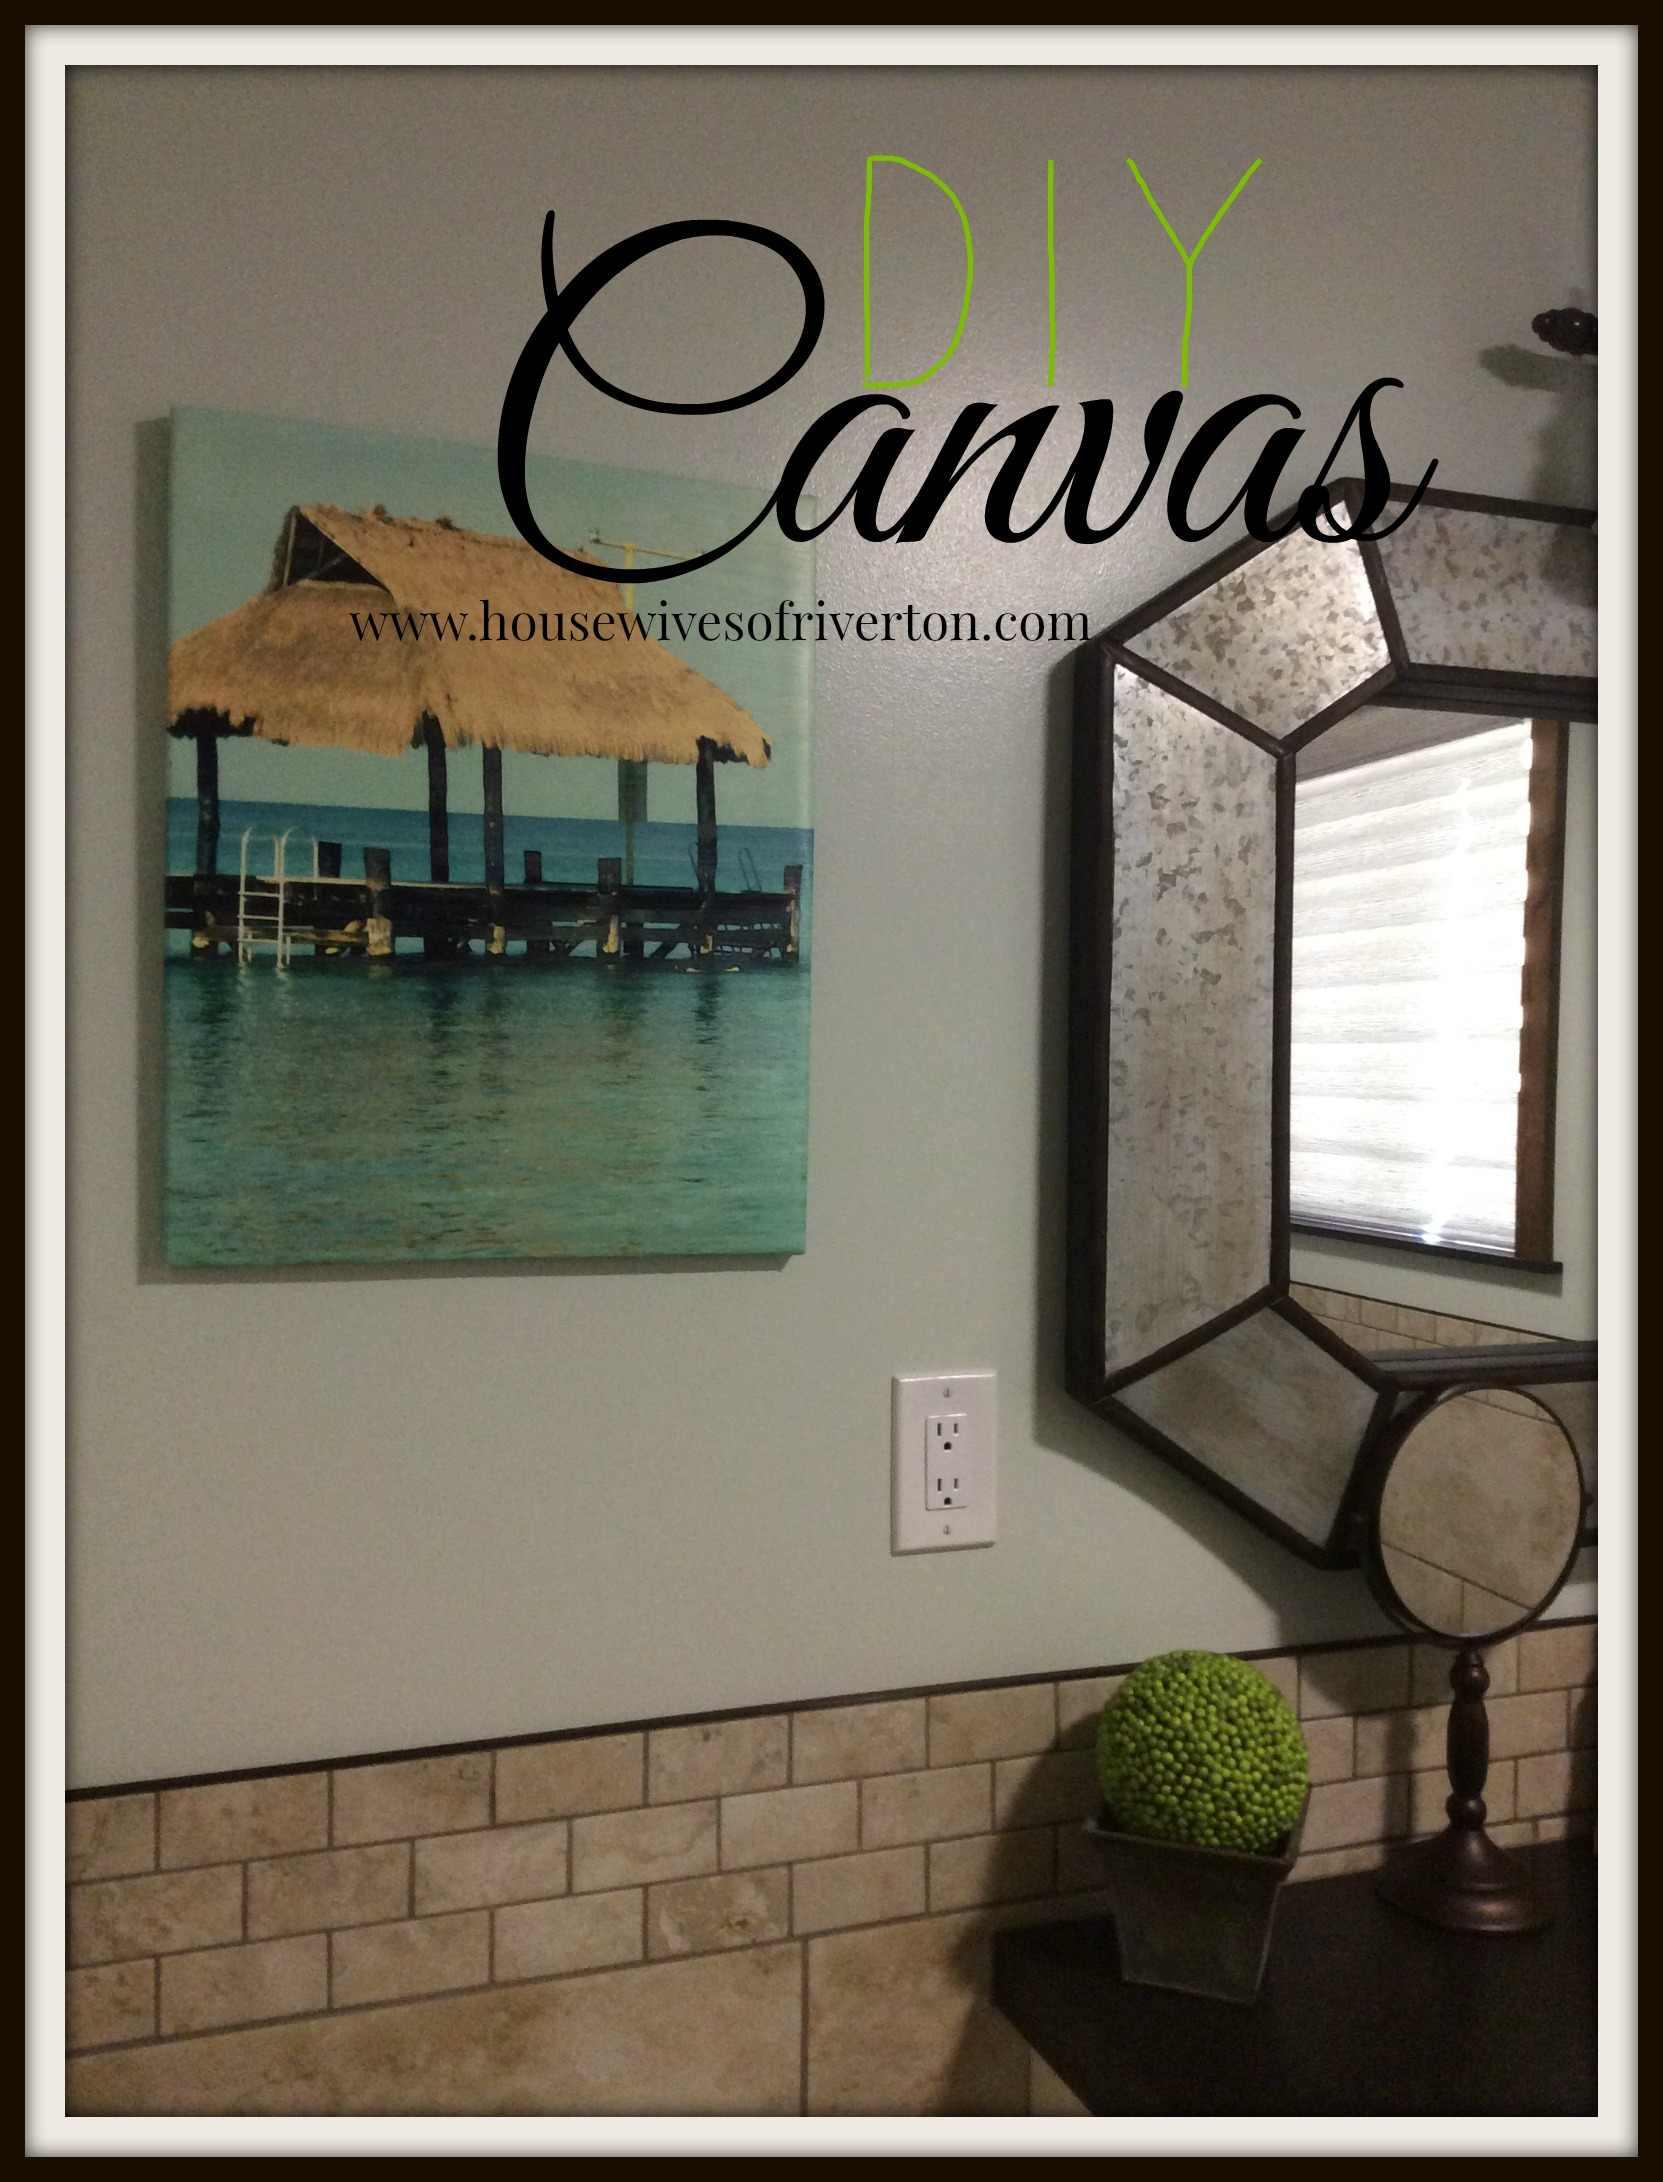 DIY Canvas Picture